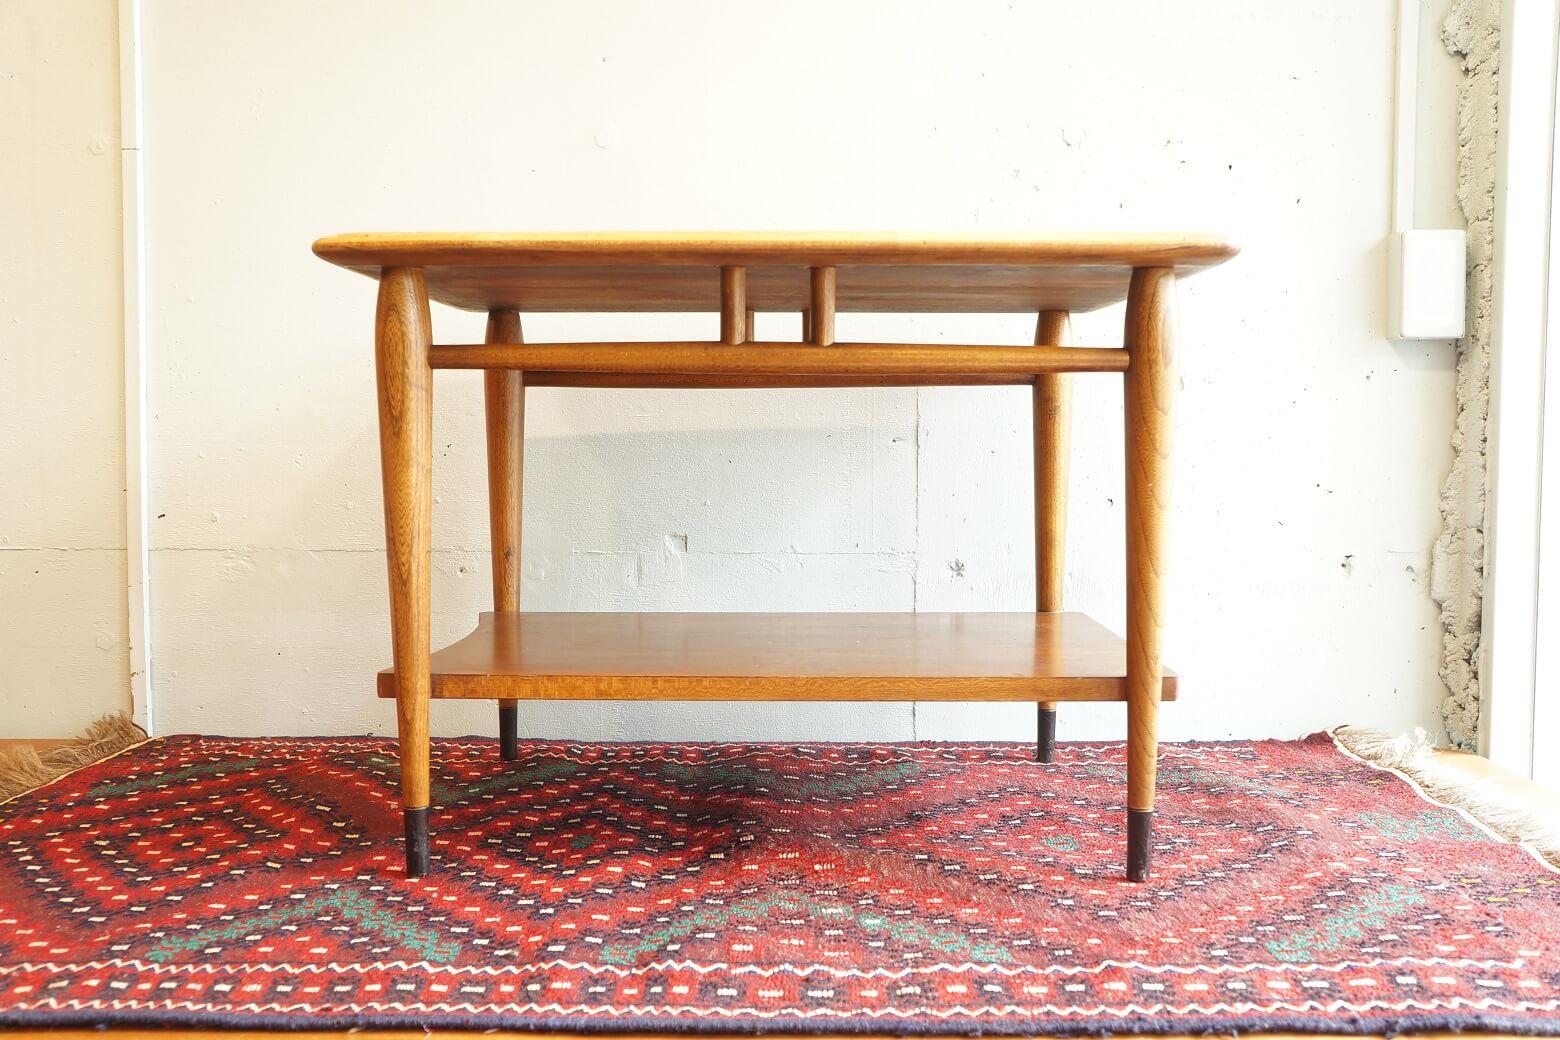 50's US vintage LANE ACCLAIM side table/50年代 アメリカヴィンテージ レーン アクレーム サイドテーブル